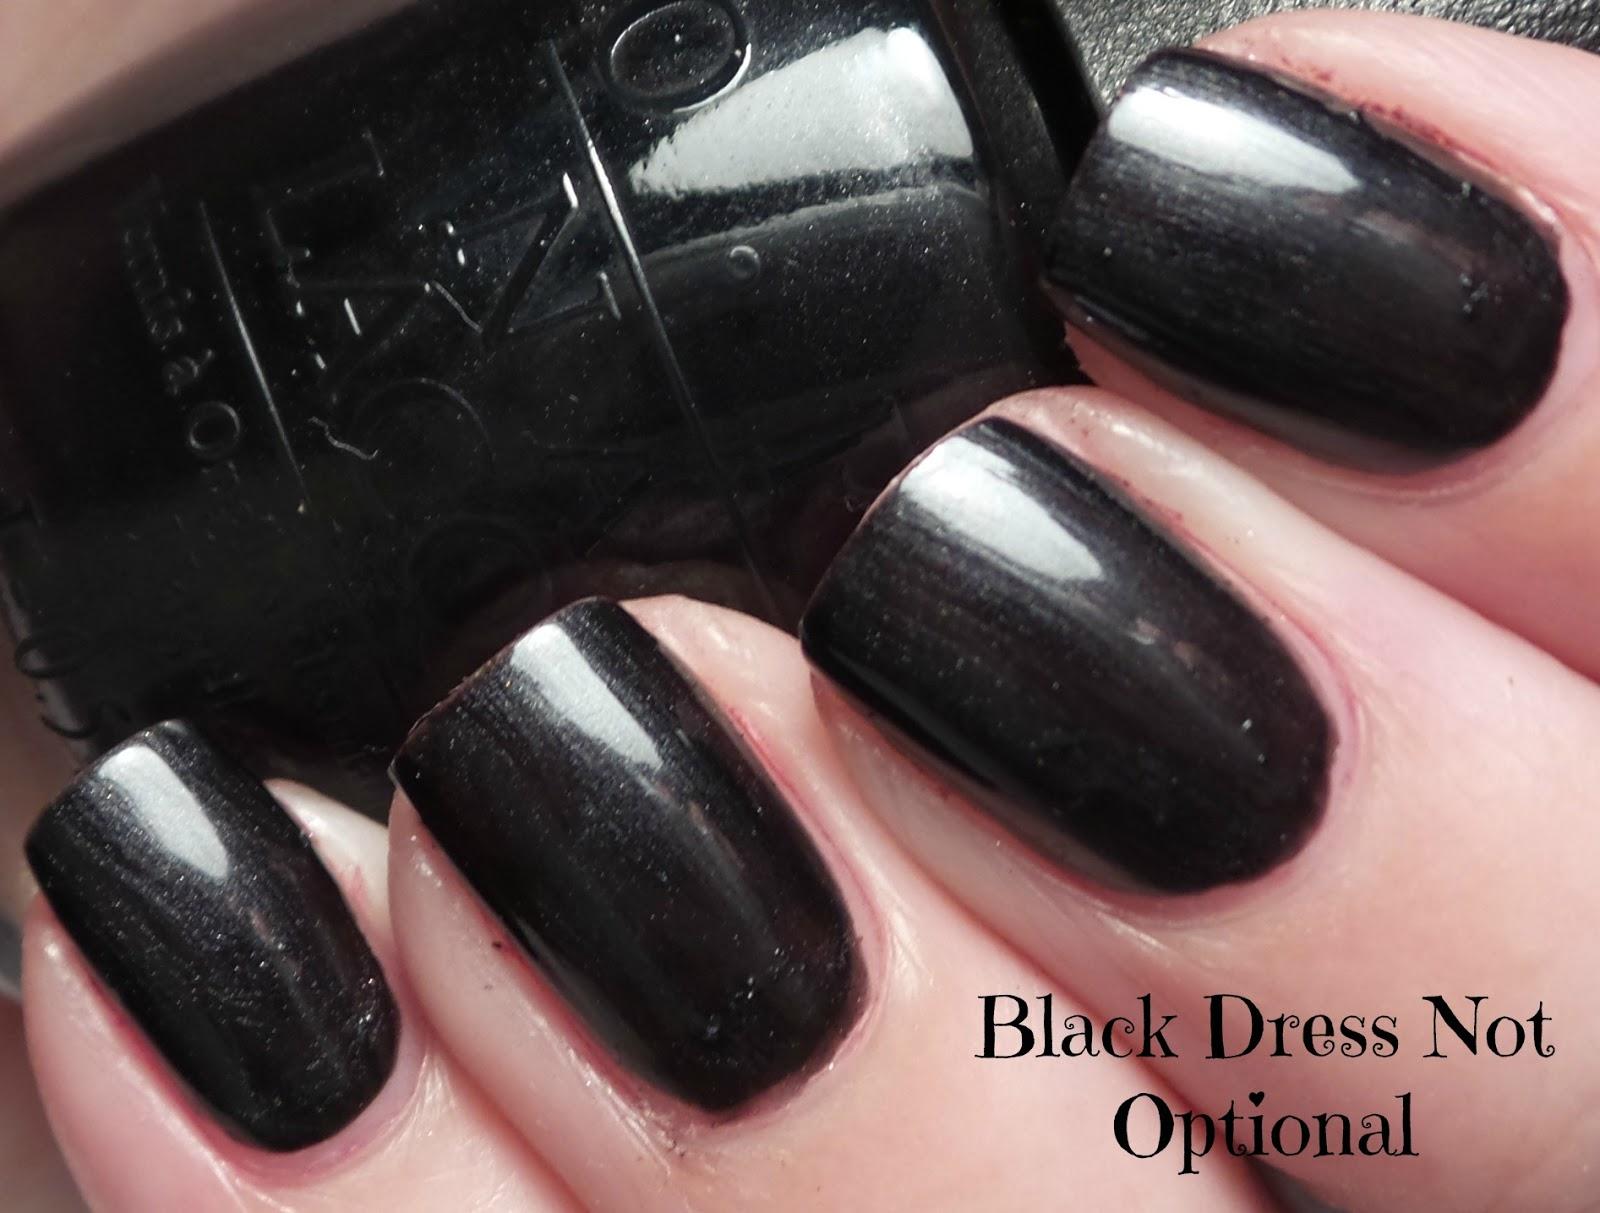 Black dress not optional opi 80